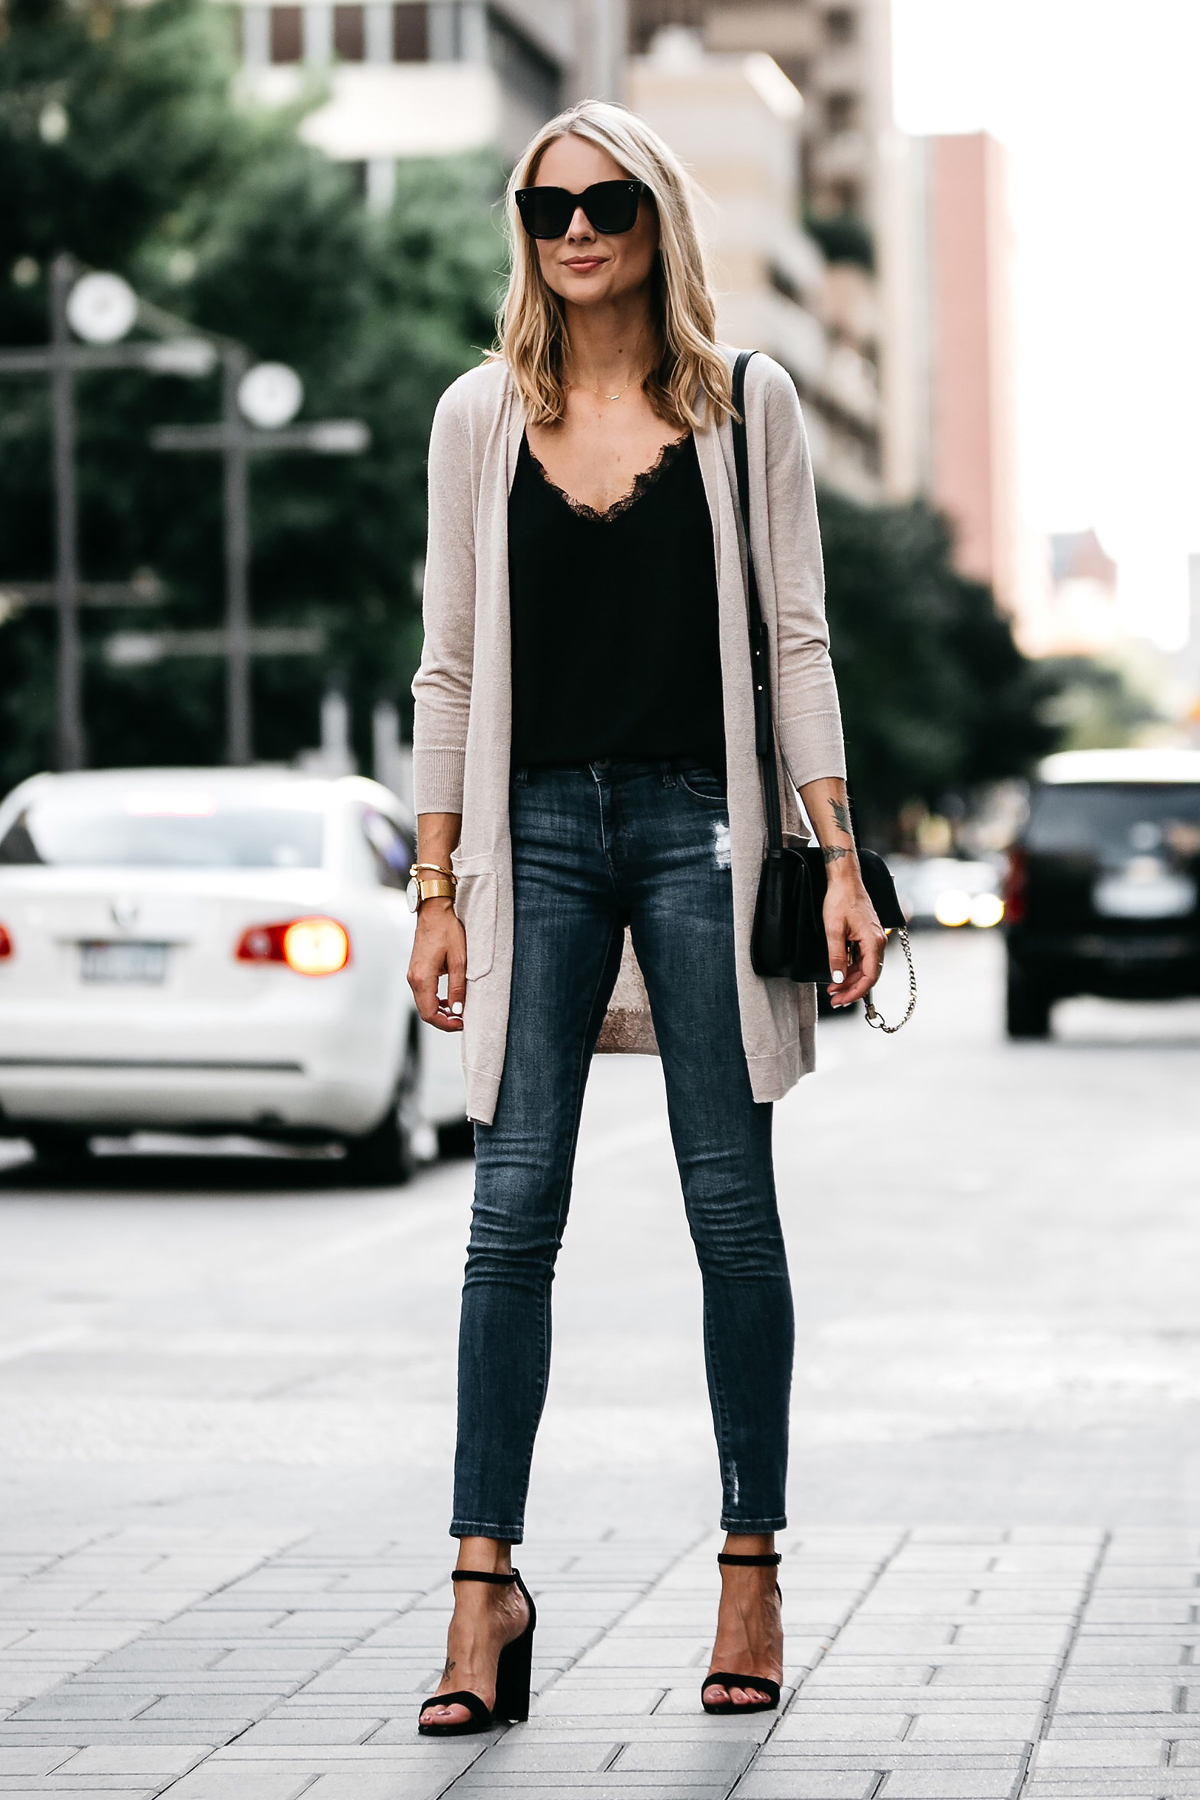 Blonde Woman Wearing Long Tan Cardigan Black Lace Cami Denim Skinny Jeans Outfit Black Ankle Strap Heeled Sandals Fashion Jackson Dallas Blogger Fashion Blogger